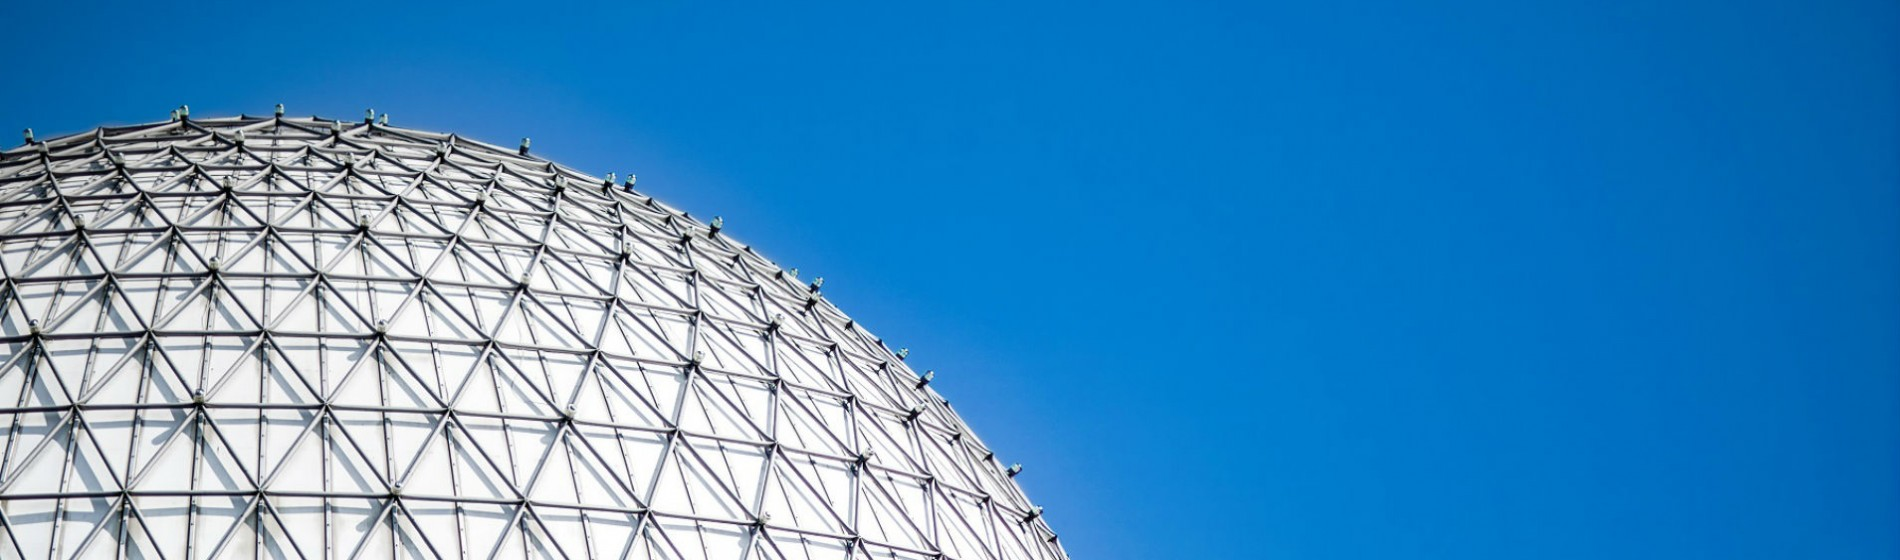 Ontarioplace-Cinesphere-blue-sky